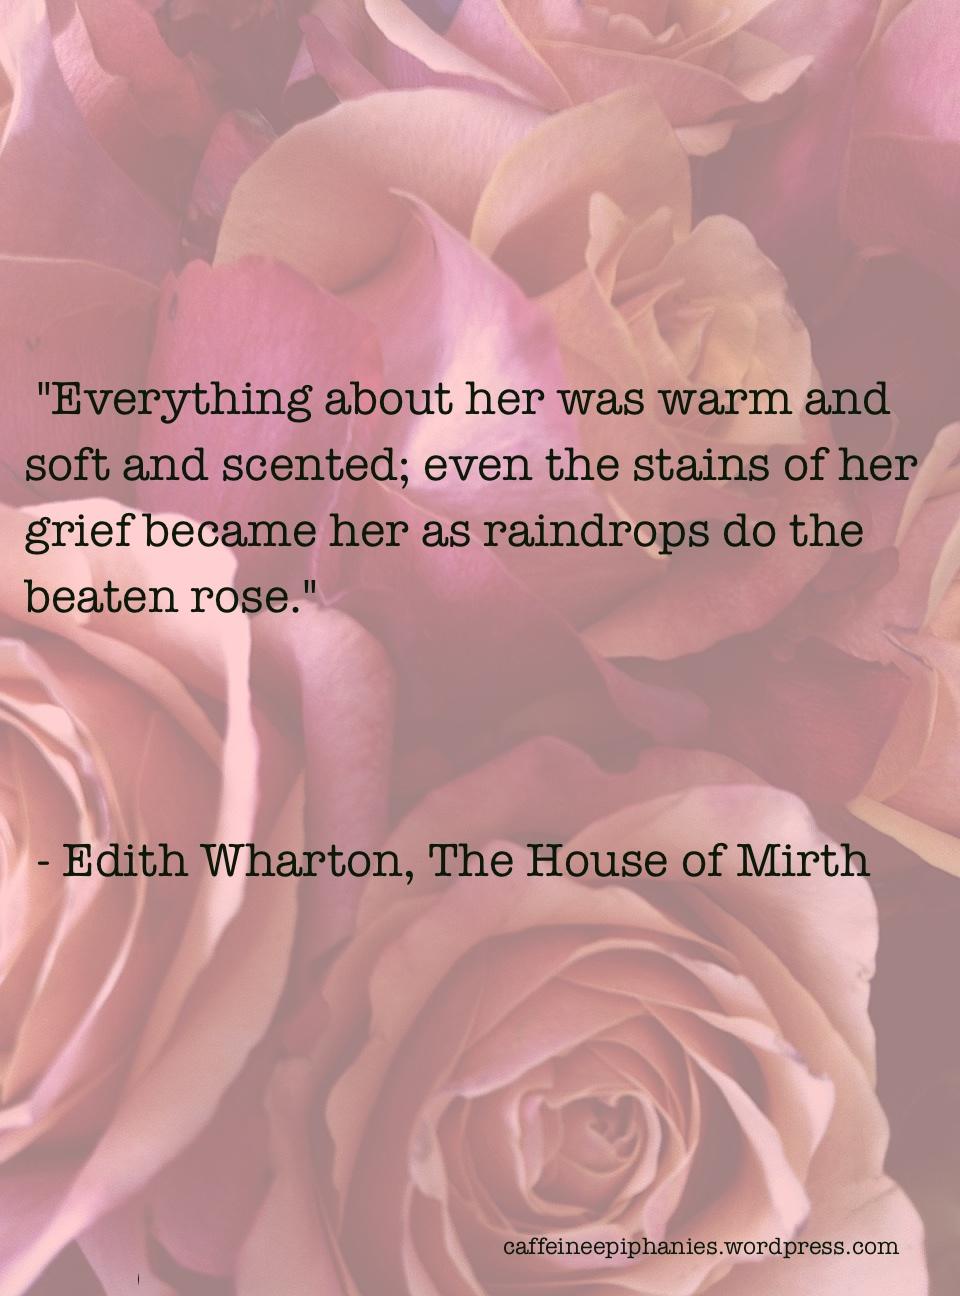 Happy Birthday Edith Wharton January 24 1862 August 11 1937